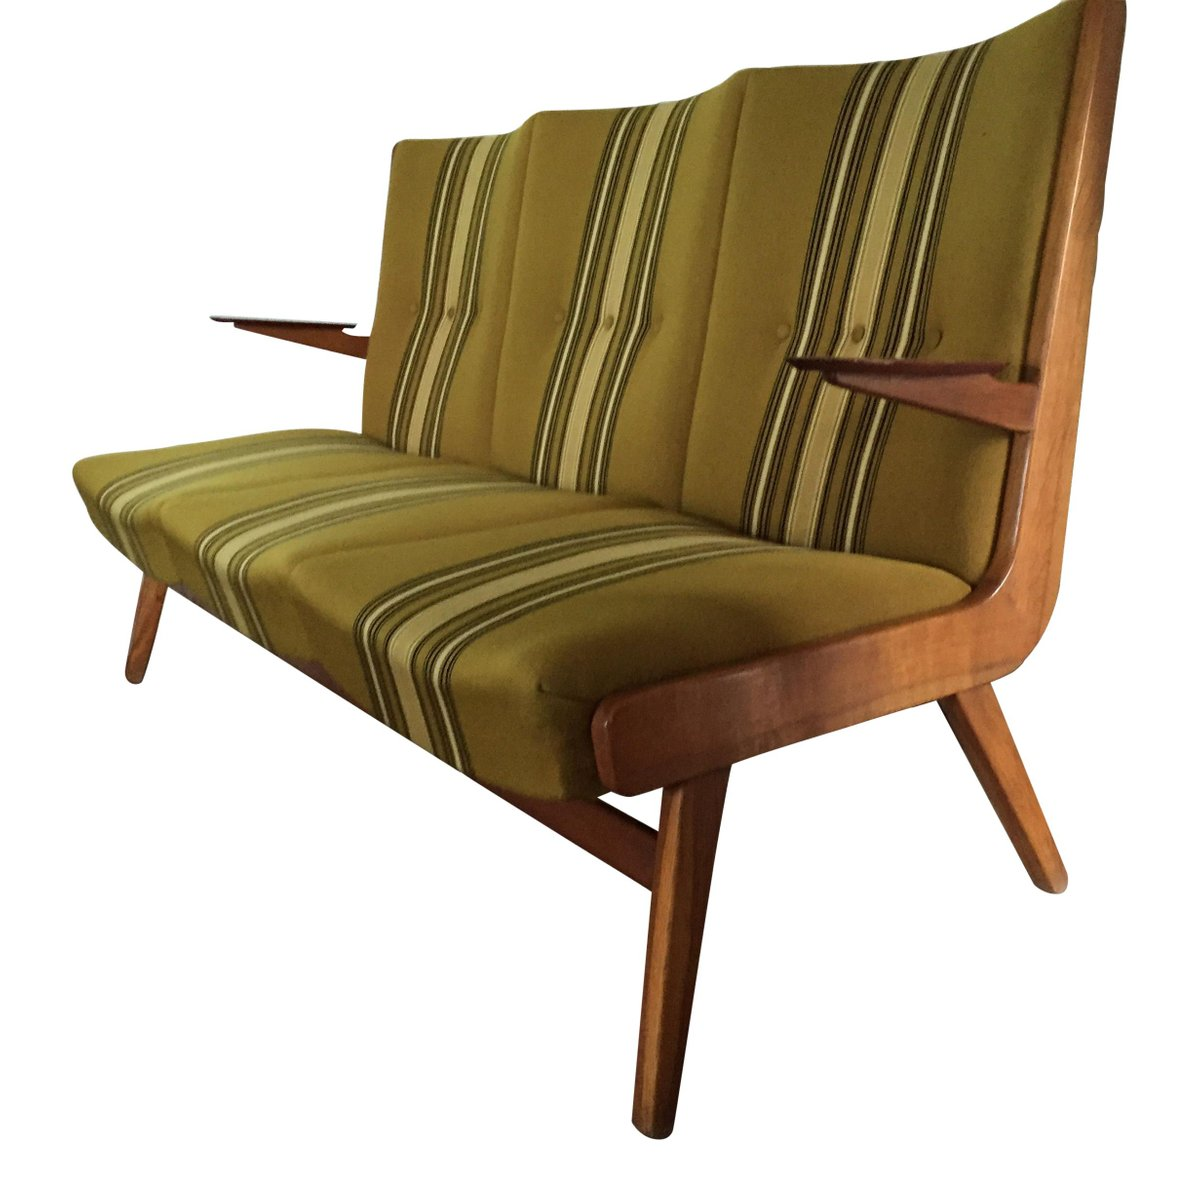 skandinavisches teak sofa 1960er bei pamono kaufen. Black Bedroom Furniture Sets. Home Design Ideas